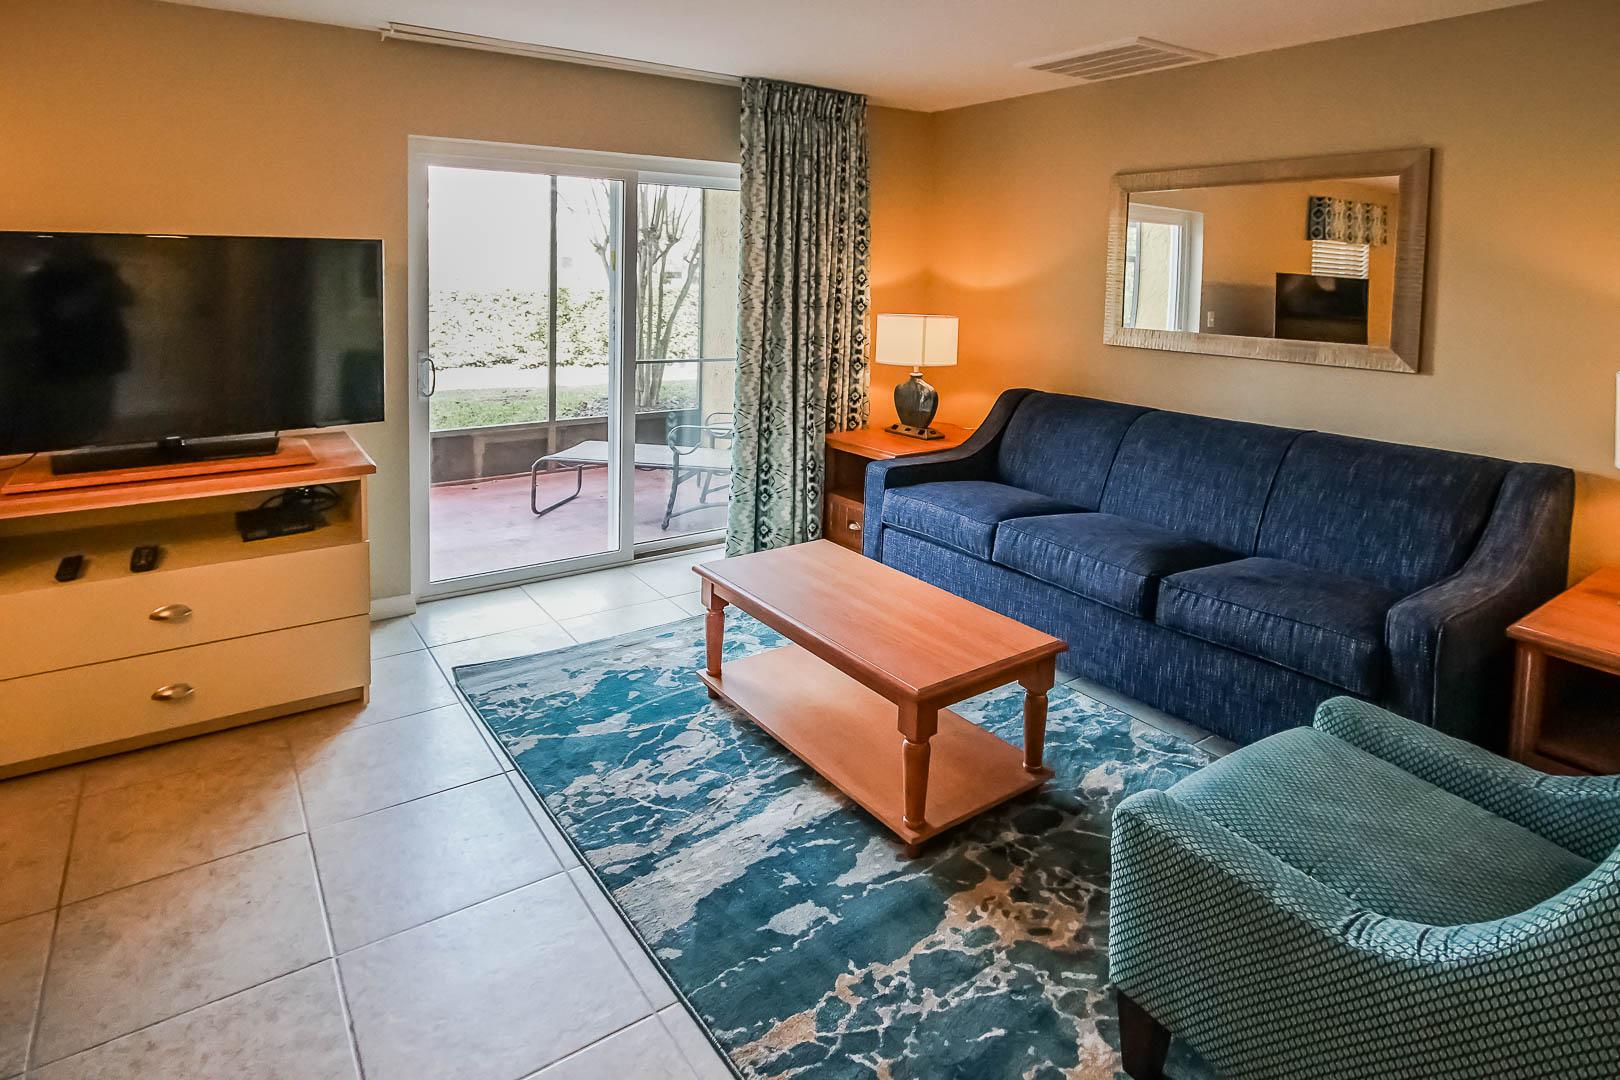 A modern living room area at VRI's Fantasy World Resort in Florida.